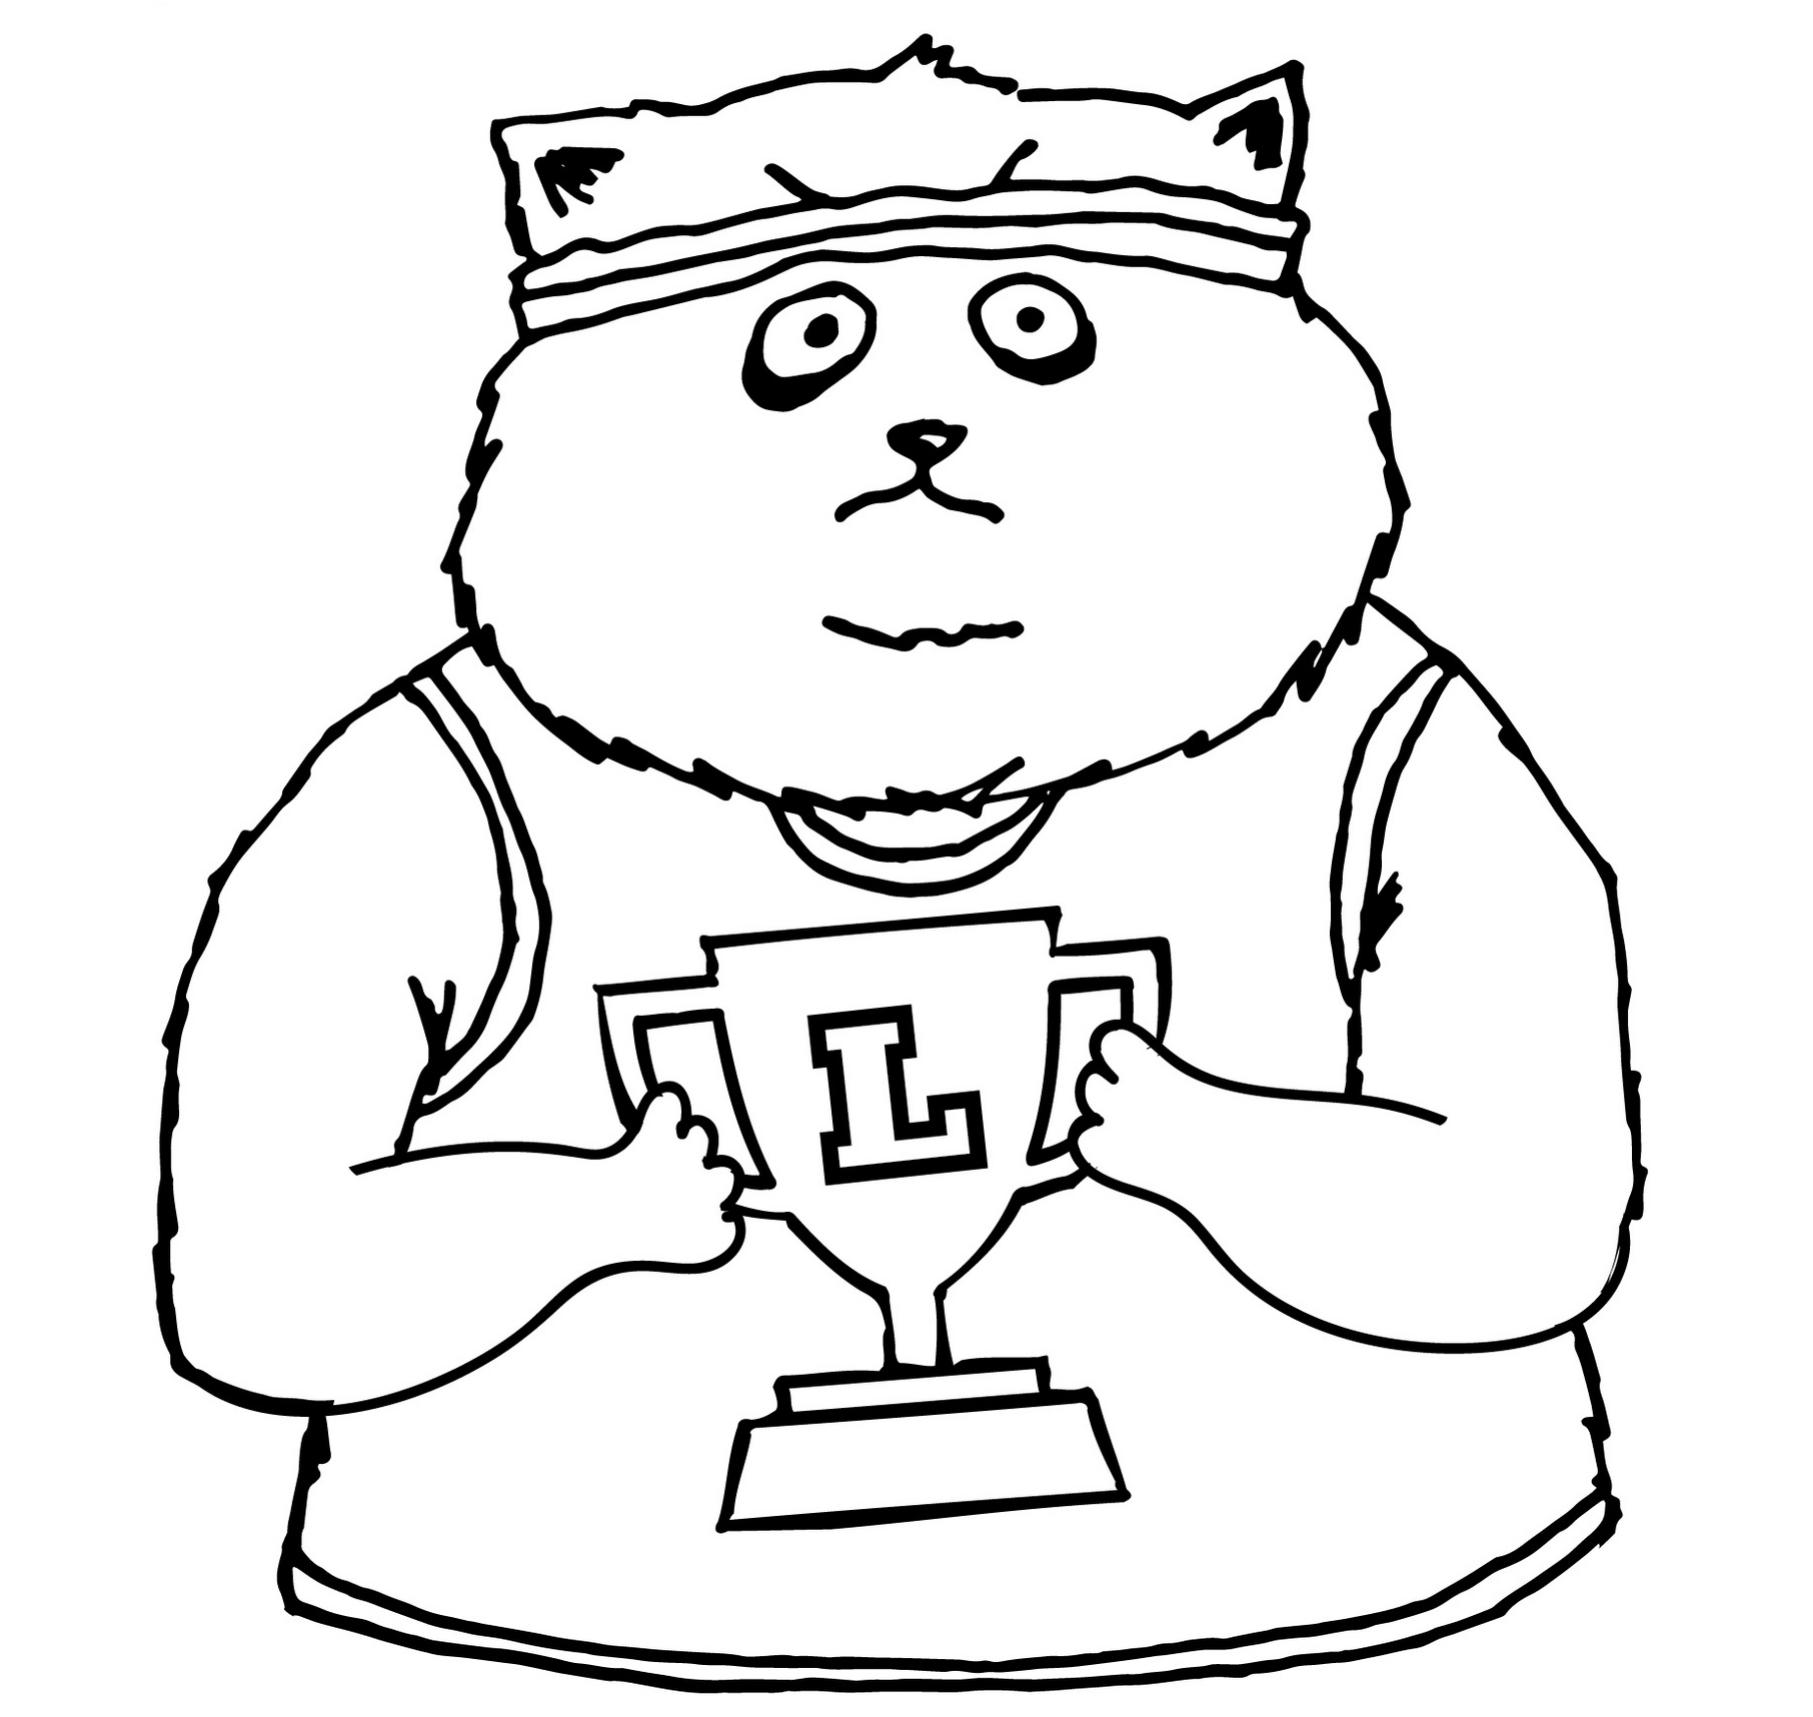 Larsenfest Fat Animal - trophy-02.jpg